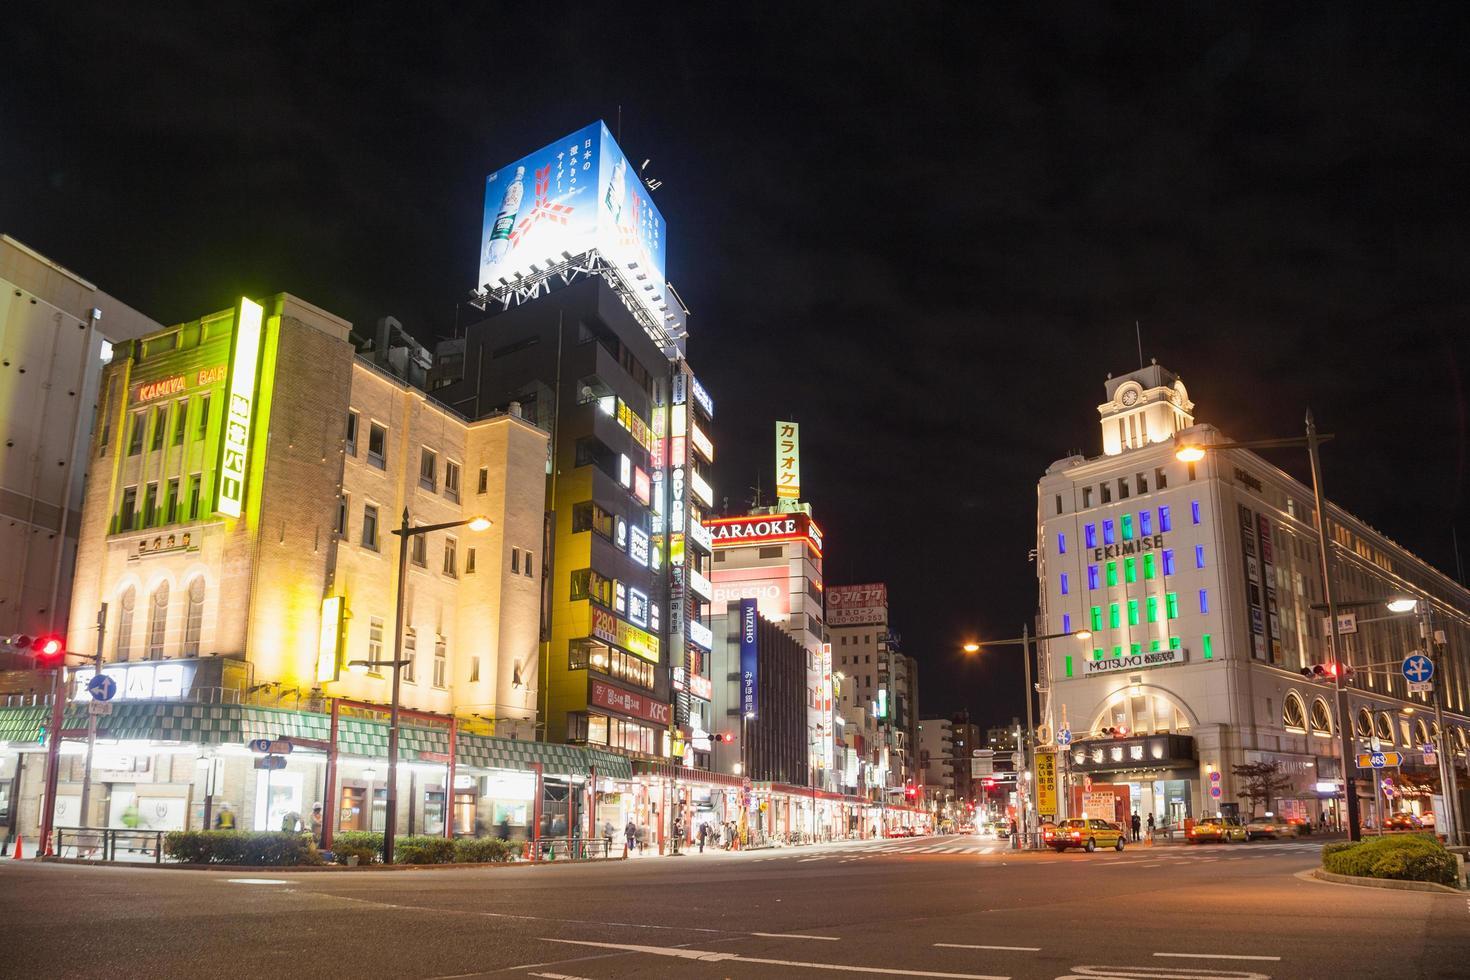 korsning i Asakusa, Tokyo i Japan foto